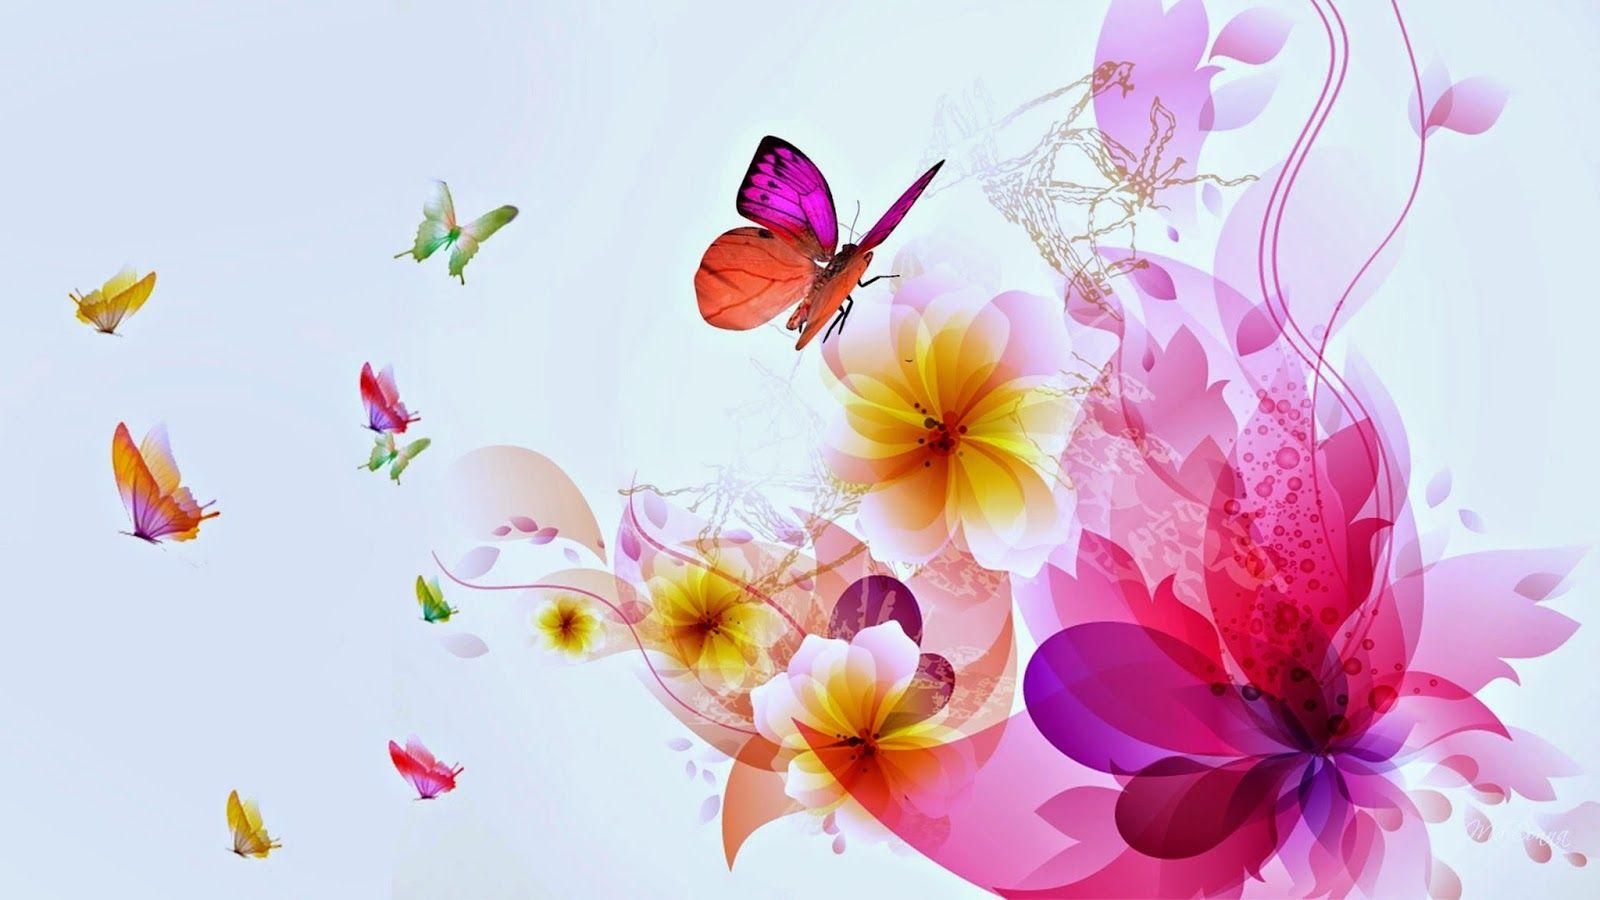 hd cute pink butterfly - photo #38